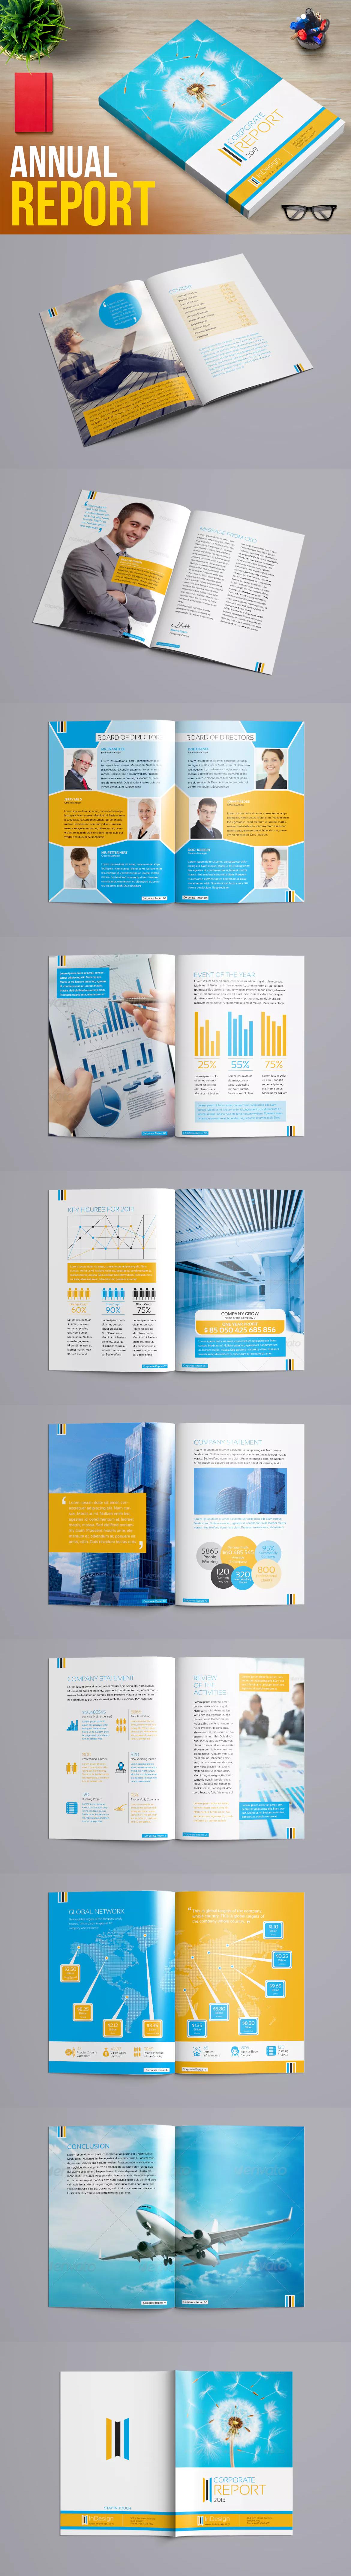 Corporate Annual Report Brochure Template InDesign INDD | Design ...